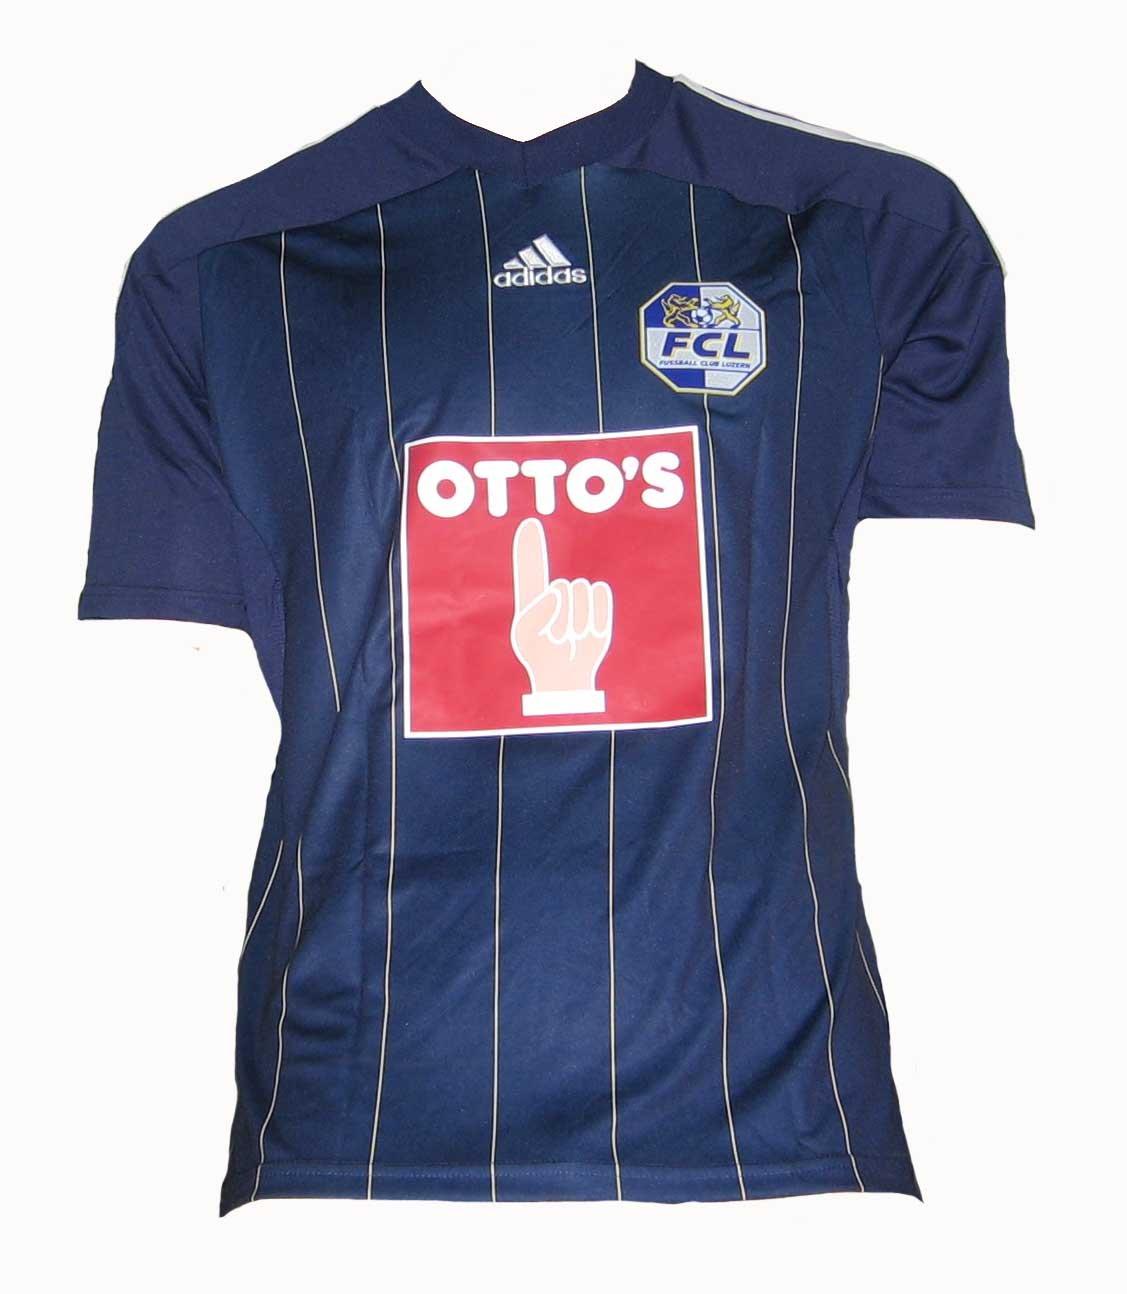 2012-13 FC Luzern Adidas Home Football Shirt